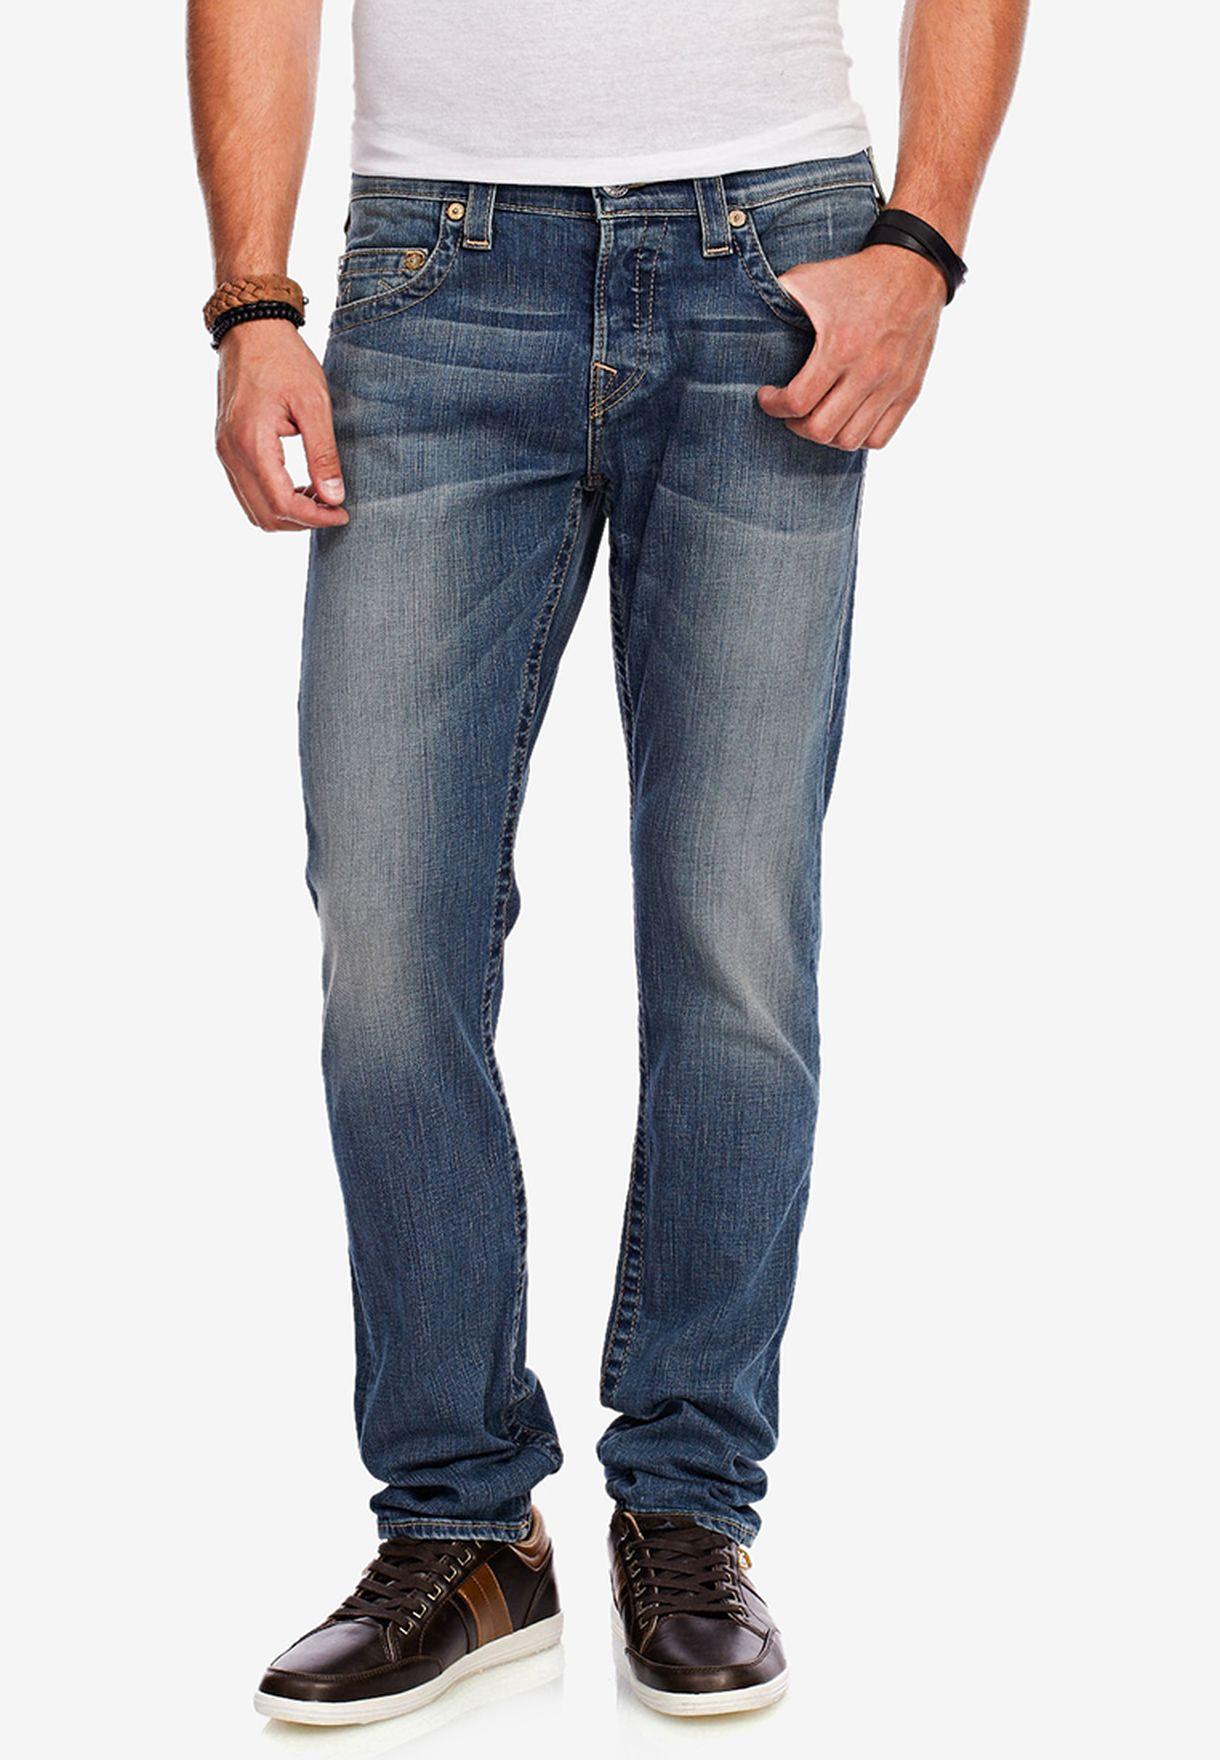 b49257f76 Shop True religion blue Rocco Skinny Jeans for Men in Bahrain ...